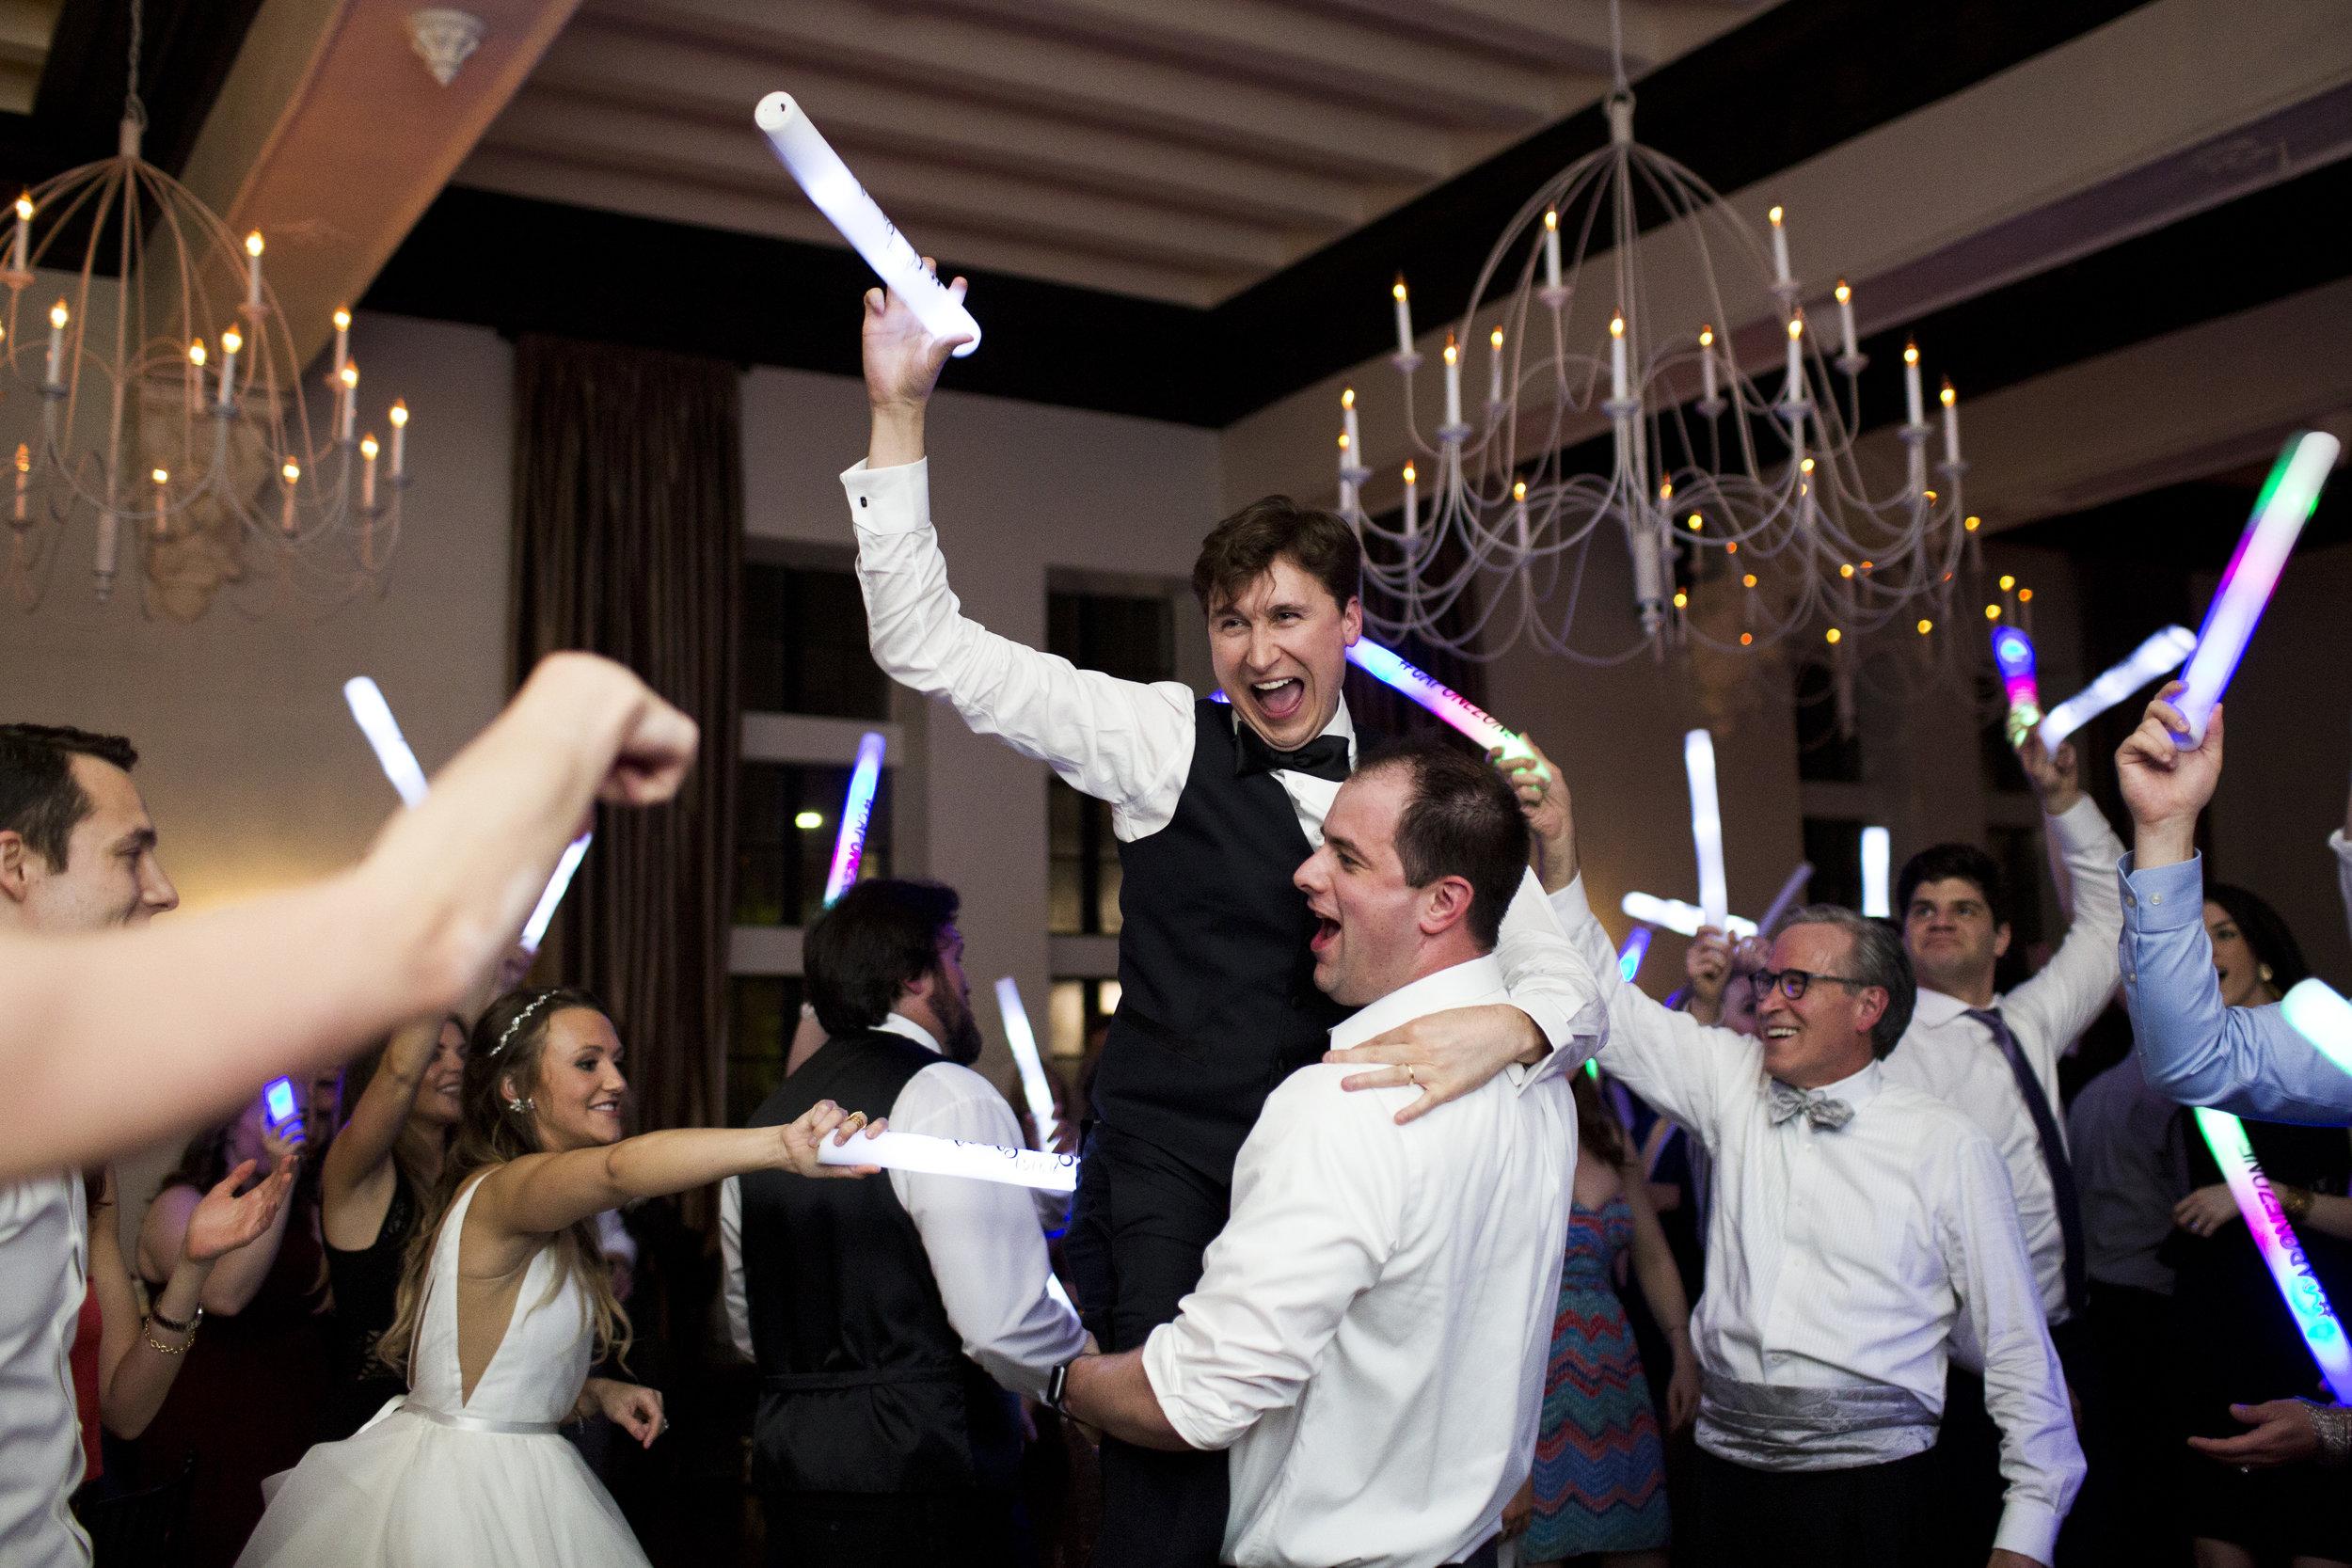 alden castle wedding recepetion photos